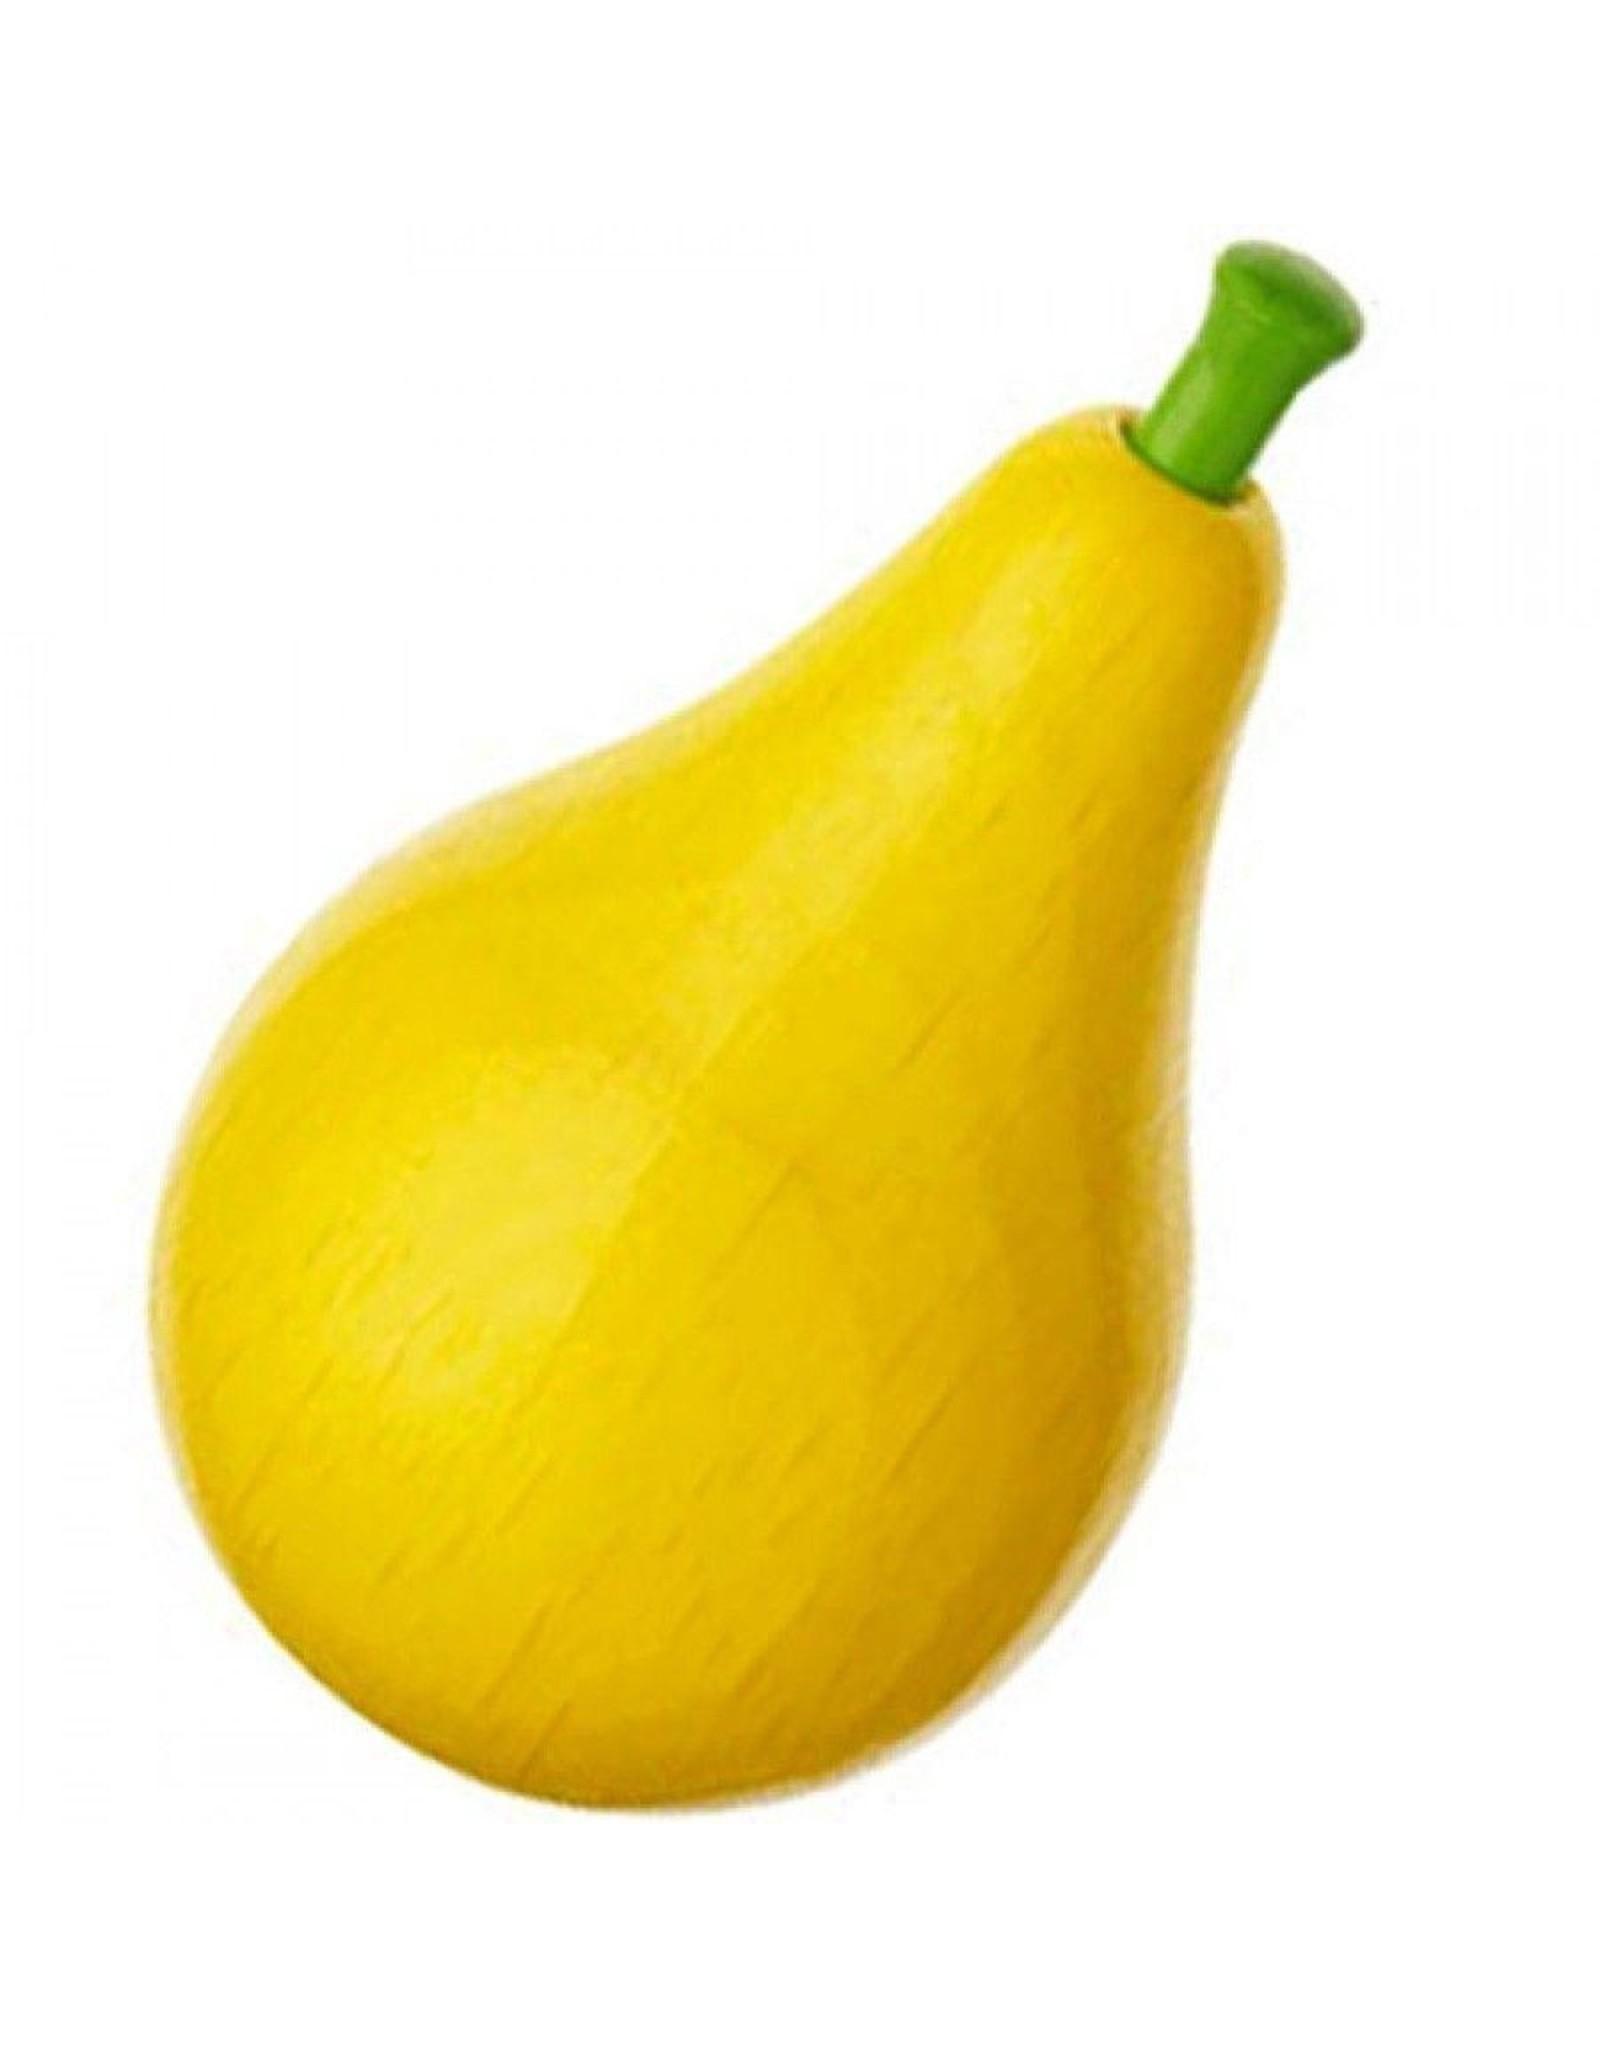 HABA Pear  Wooden Fruit